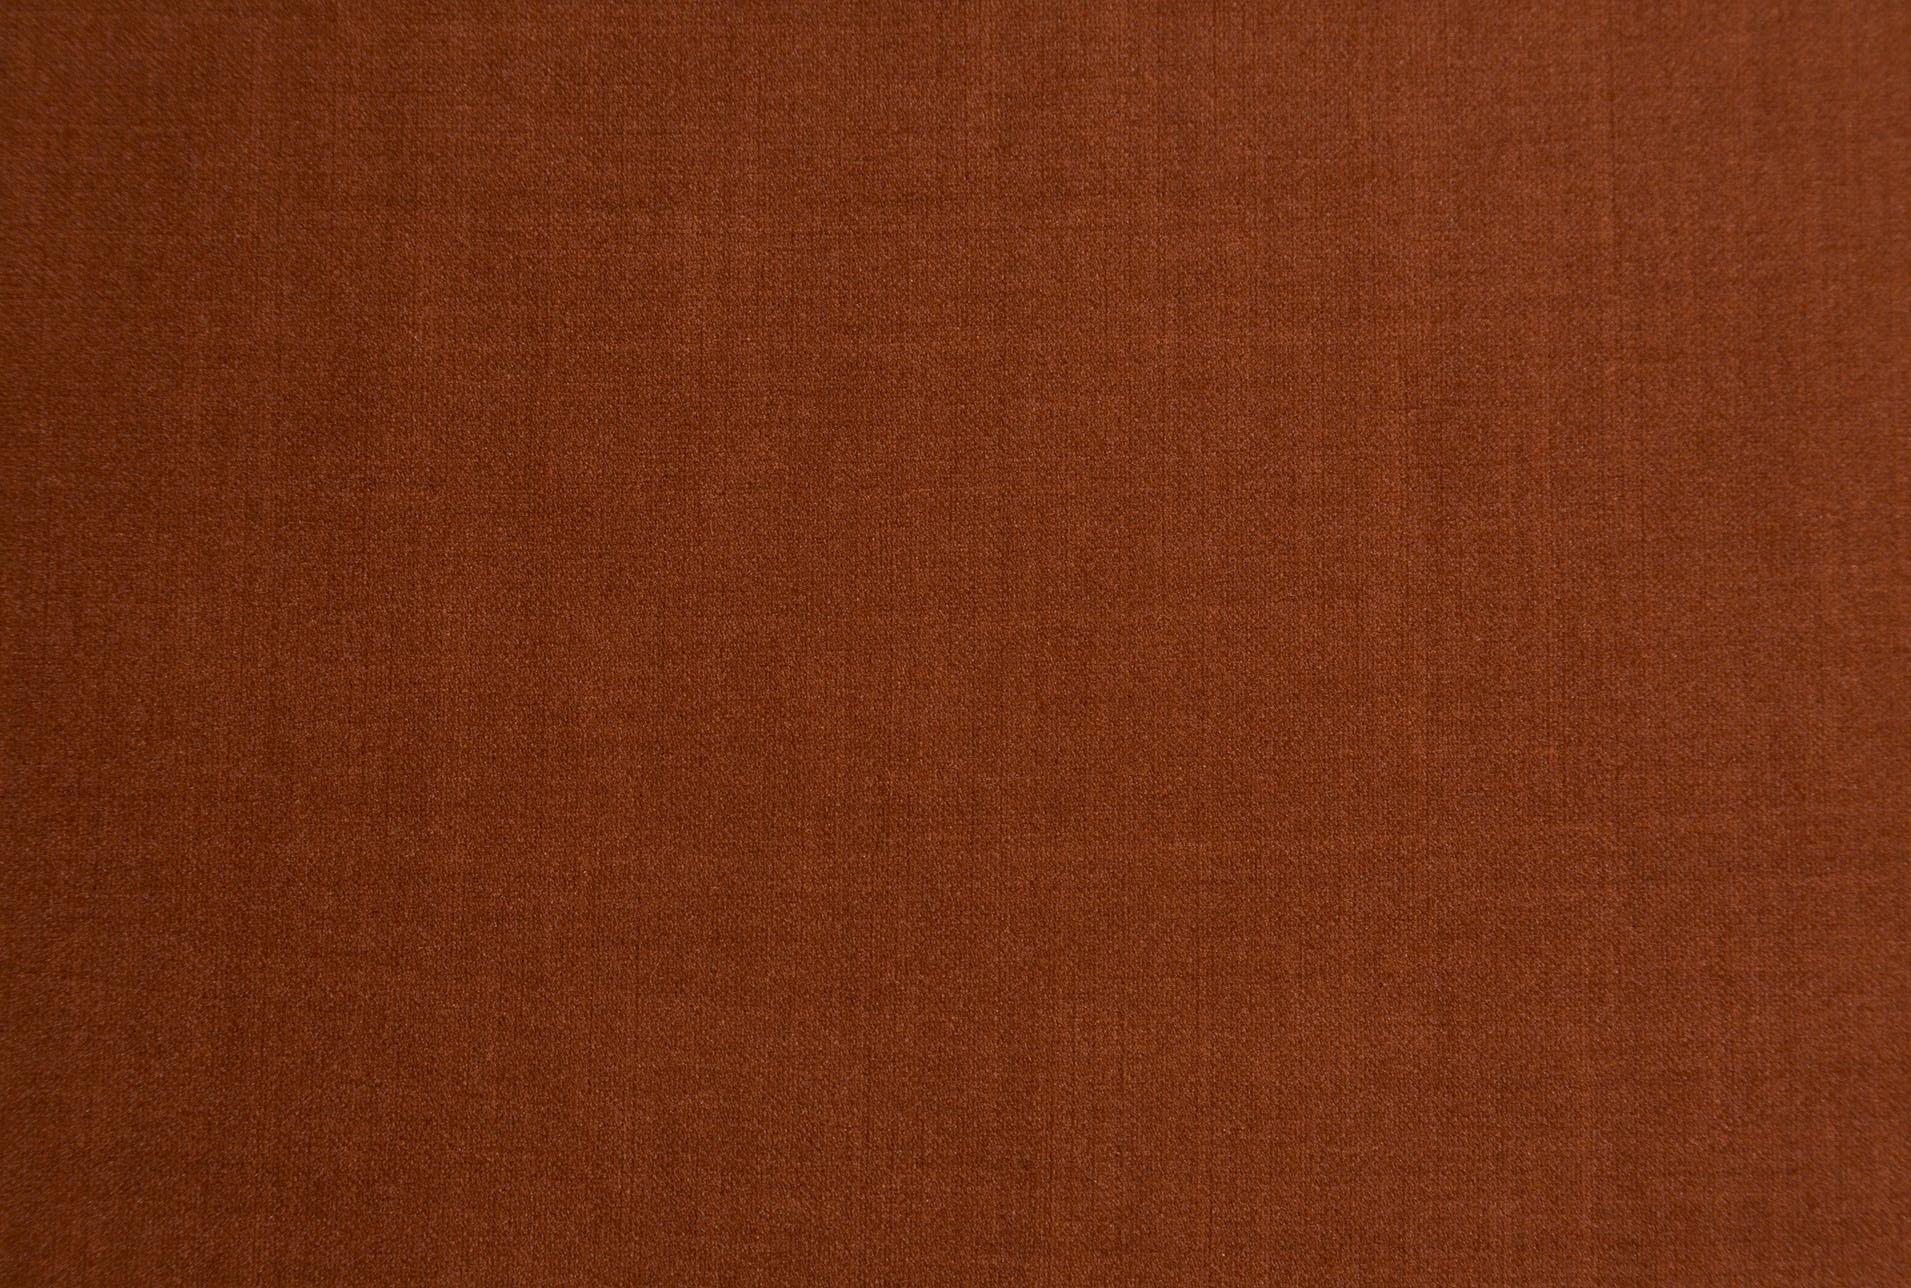 Soane 3 Piece Sectionalnate Berkus And Jeremiah Brent | Products In Soane 3 Piece Sectionals By Nate Berkus And Jeremiah Brent (Image 18 of 25)